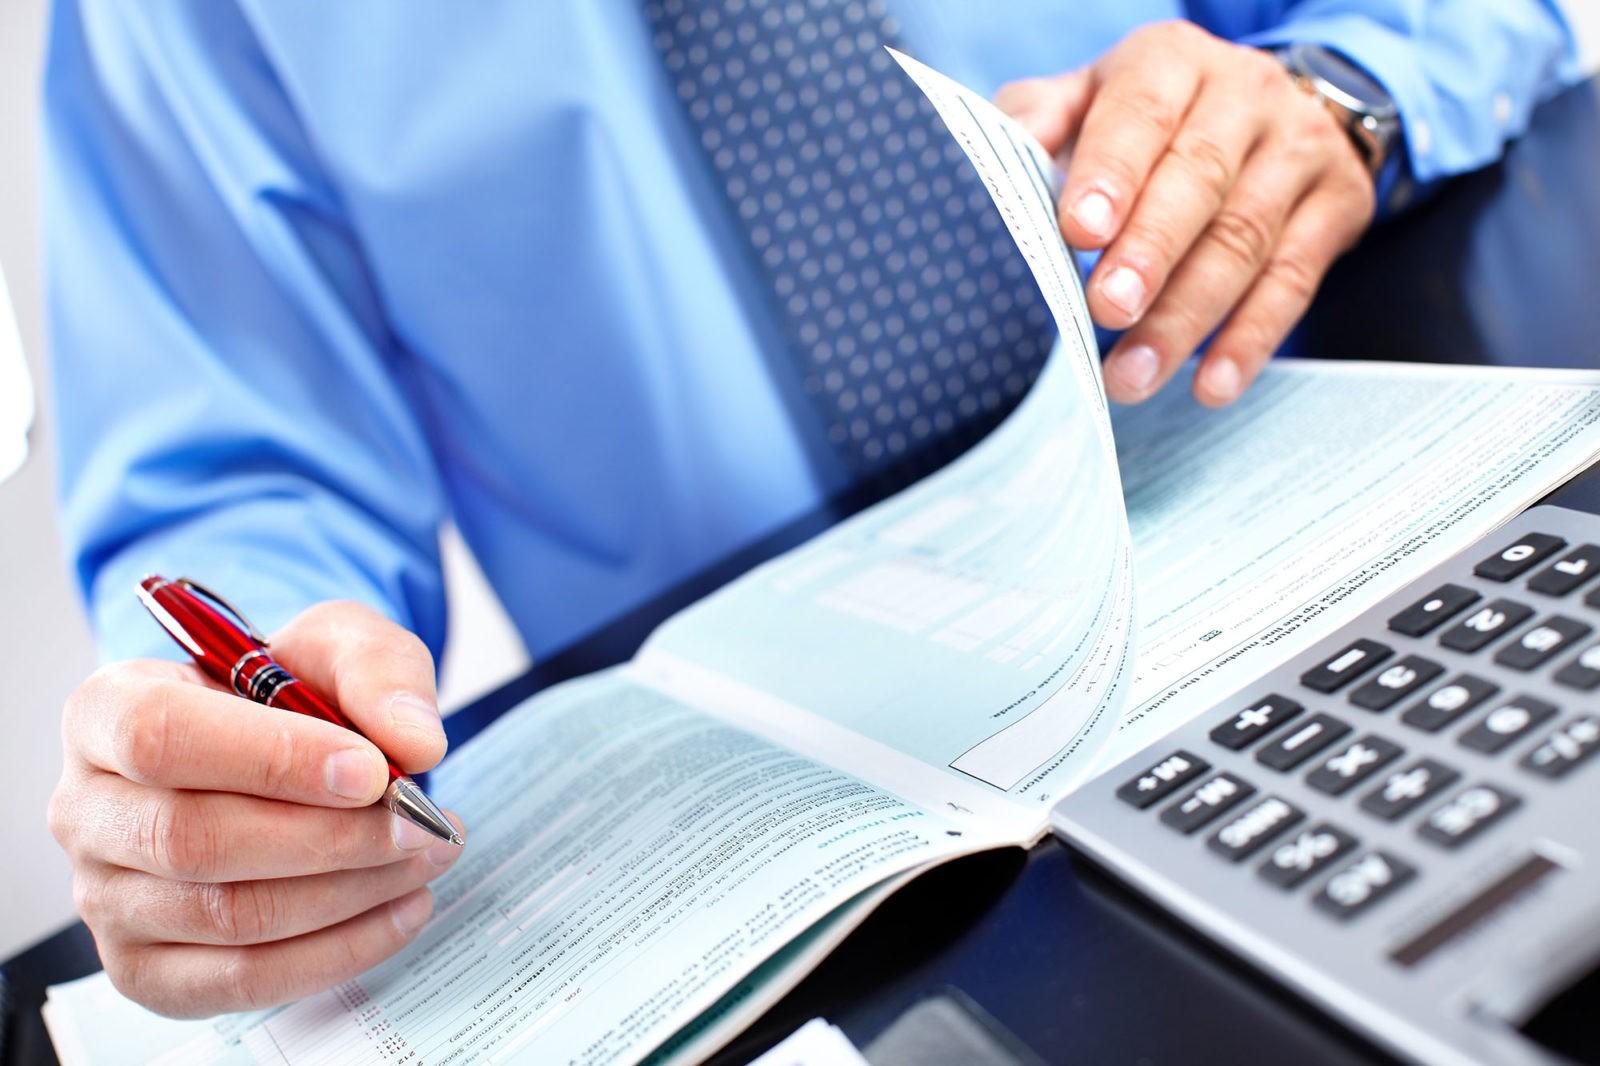 Постановка бухучета и оптимизация налогообложения